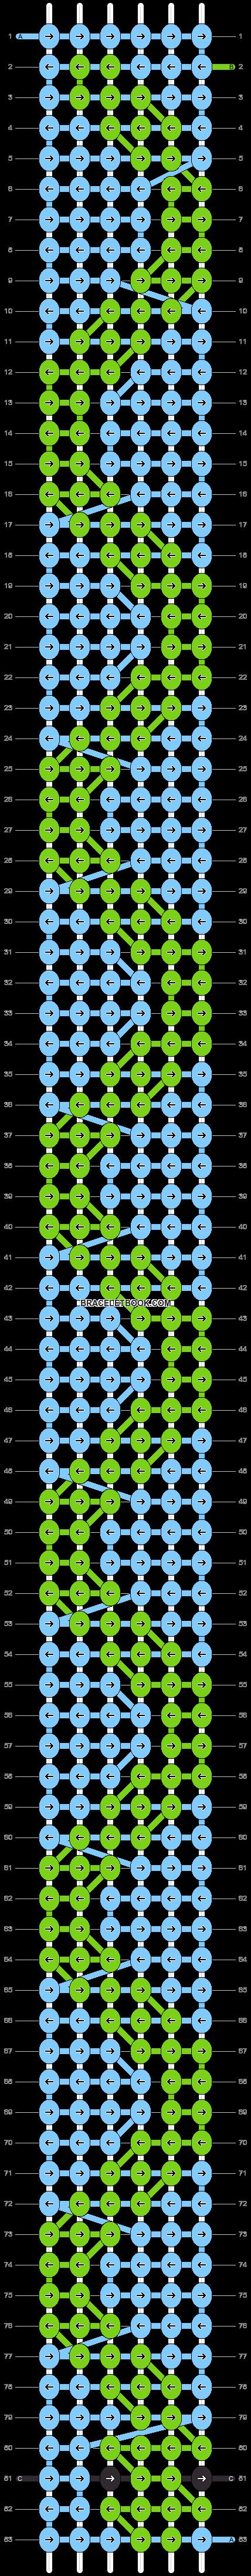 Alpha pattern #24569 pattern